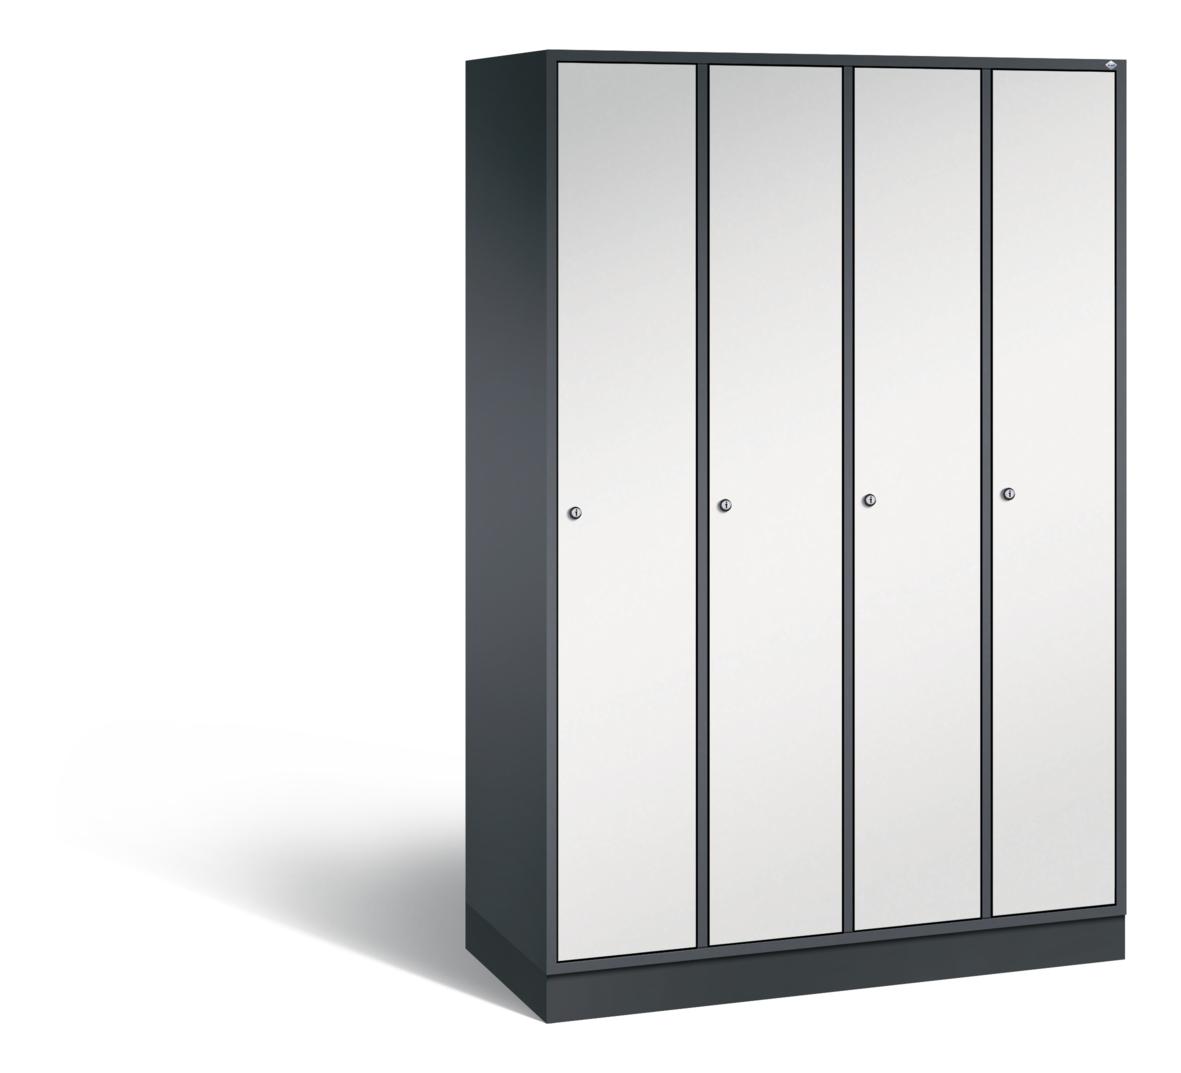 C+P Garderobenschrank Intro, H1950xB1220xT490mm